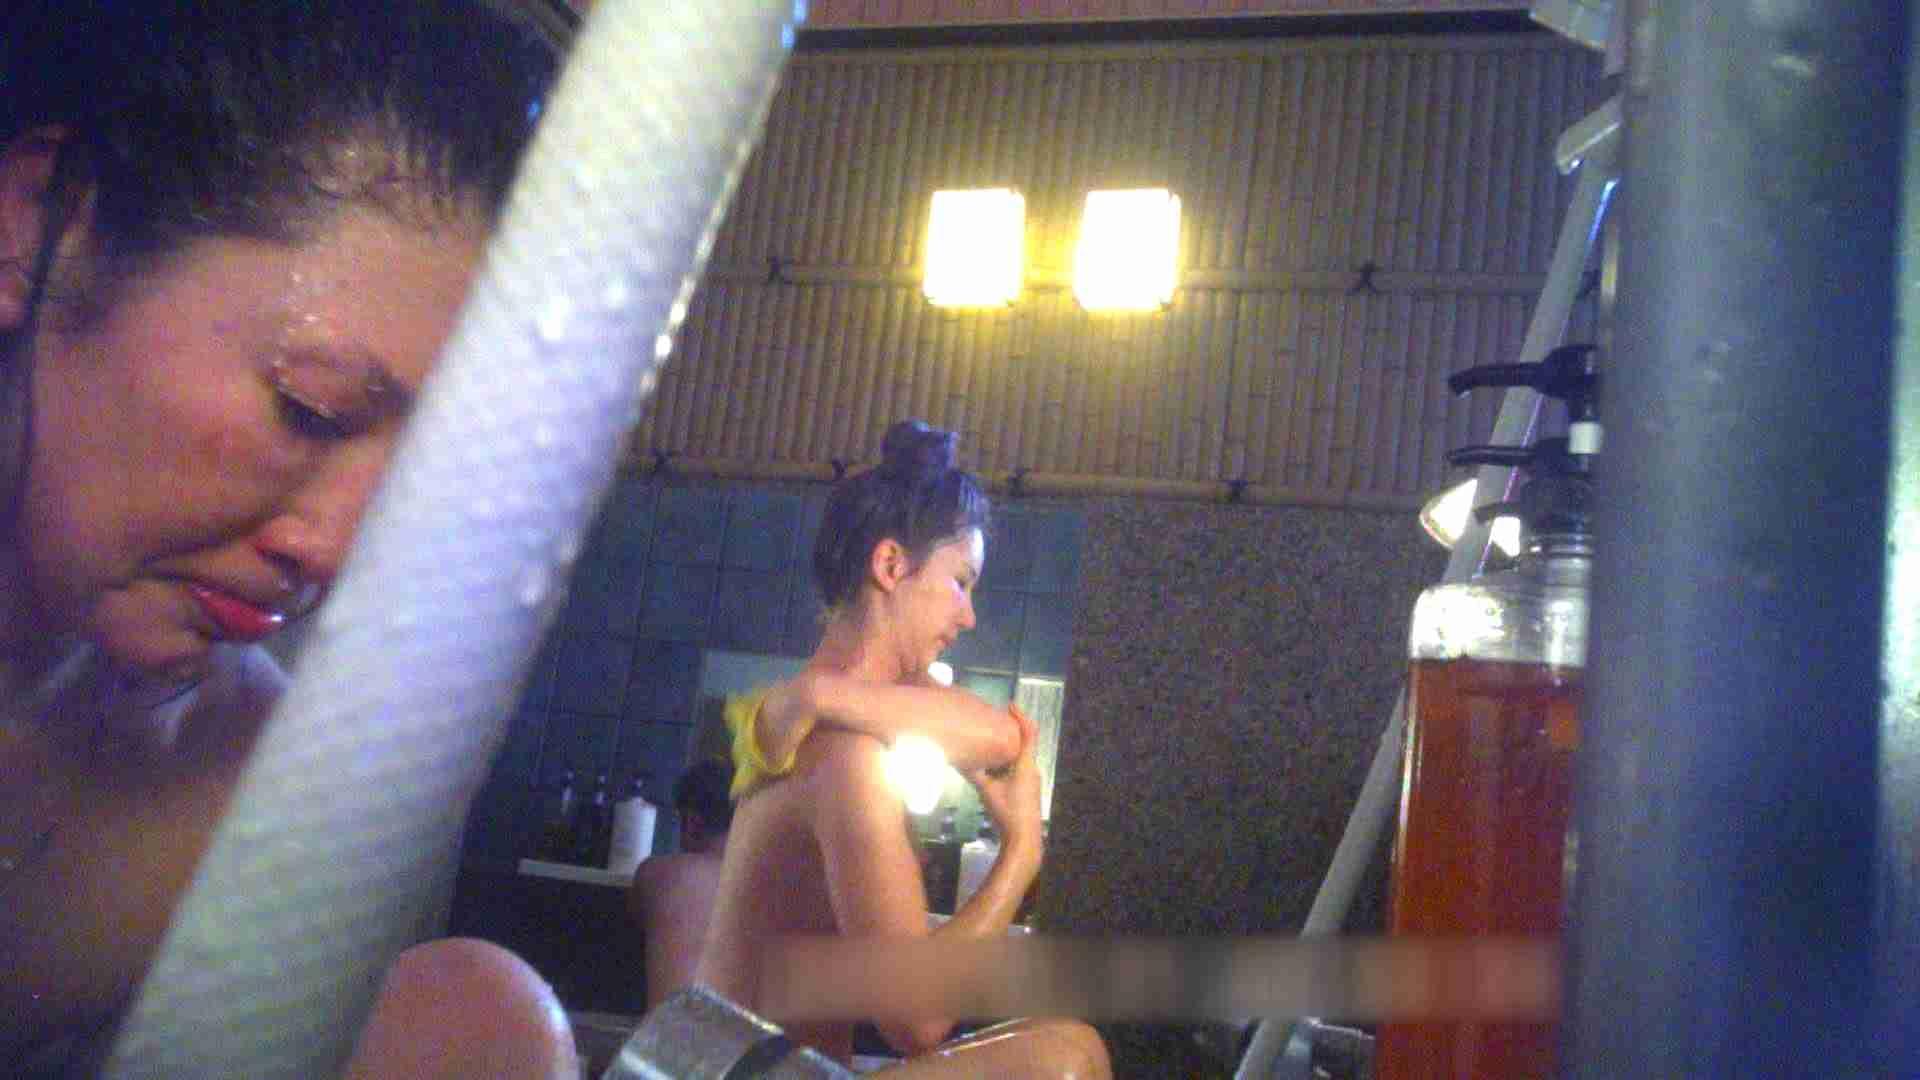 TG.15 【上等兵】高級旅館の爆乳女将で有名っぽい 潜入  86pic 74